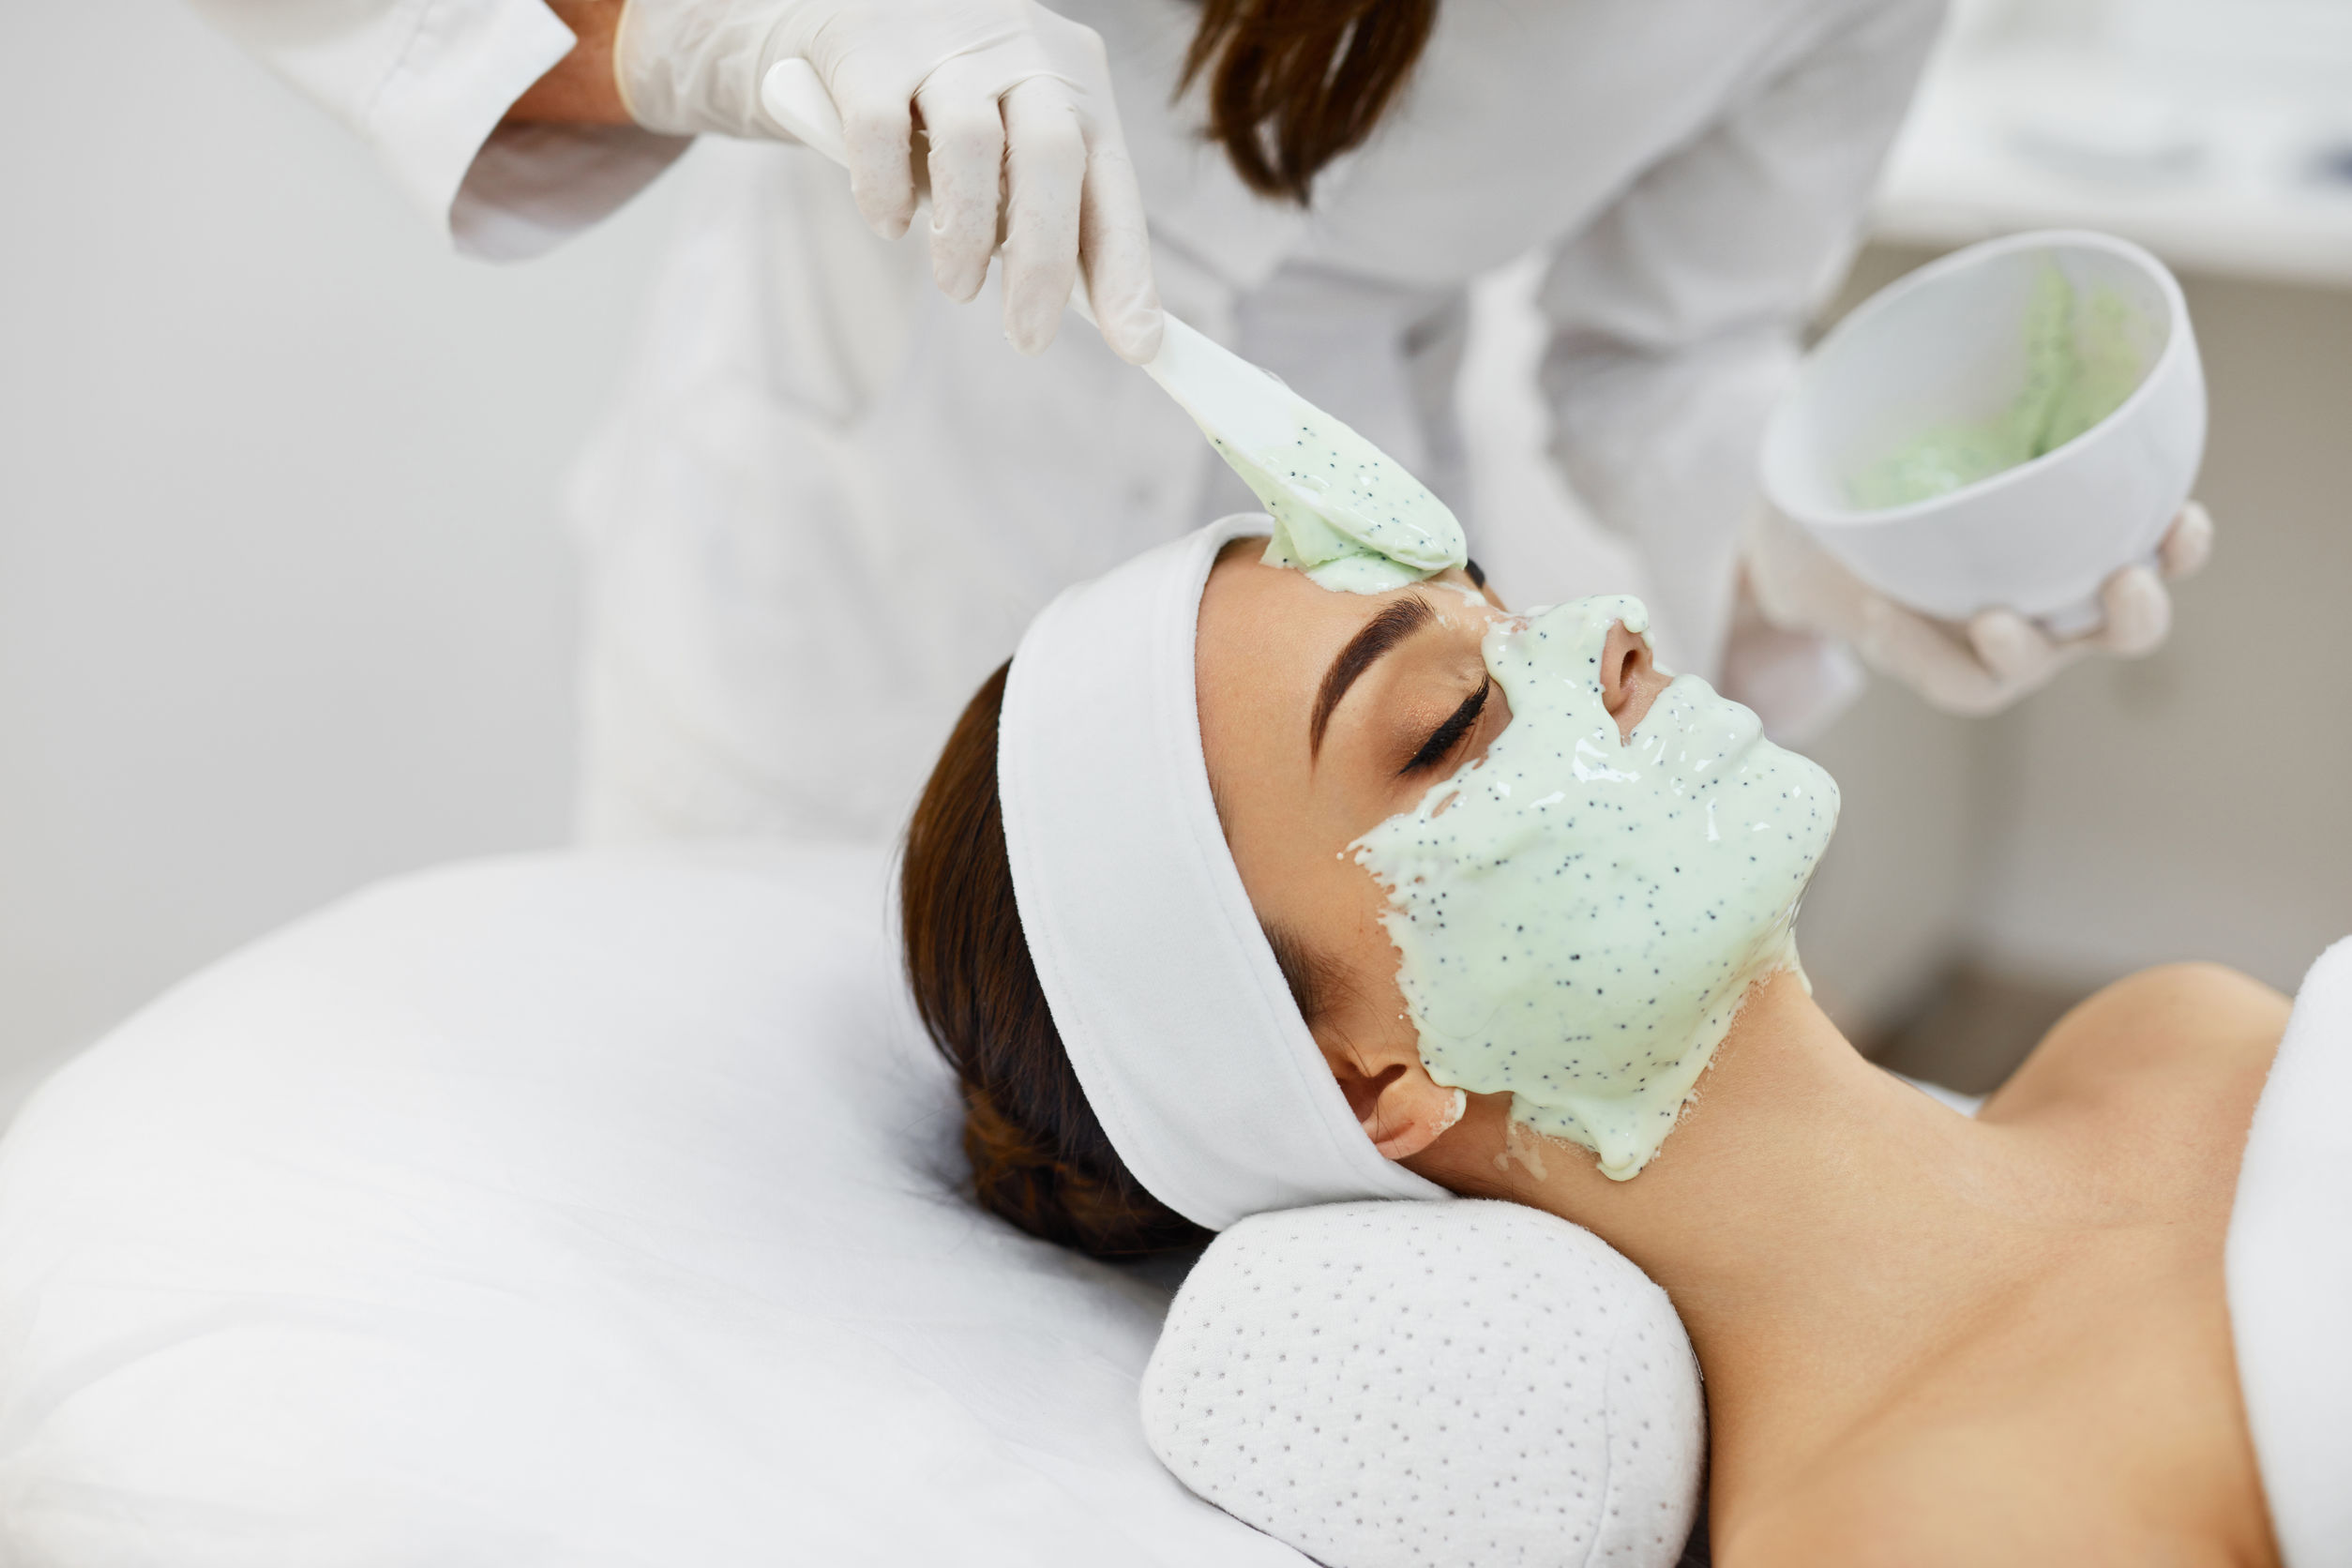 Roberto Rivera applying a treatment